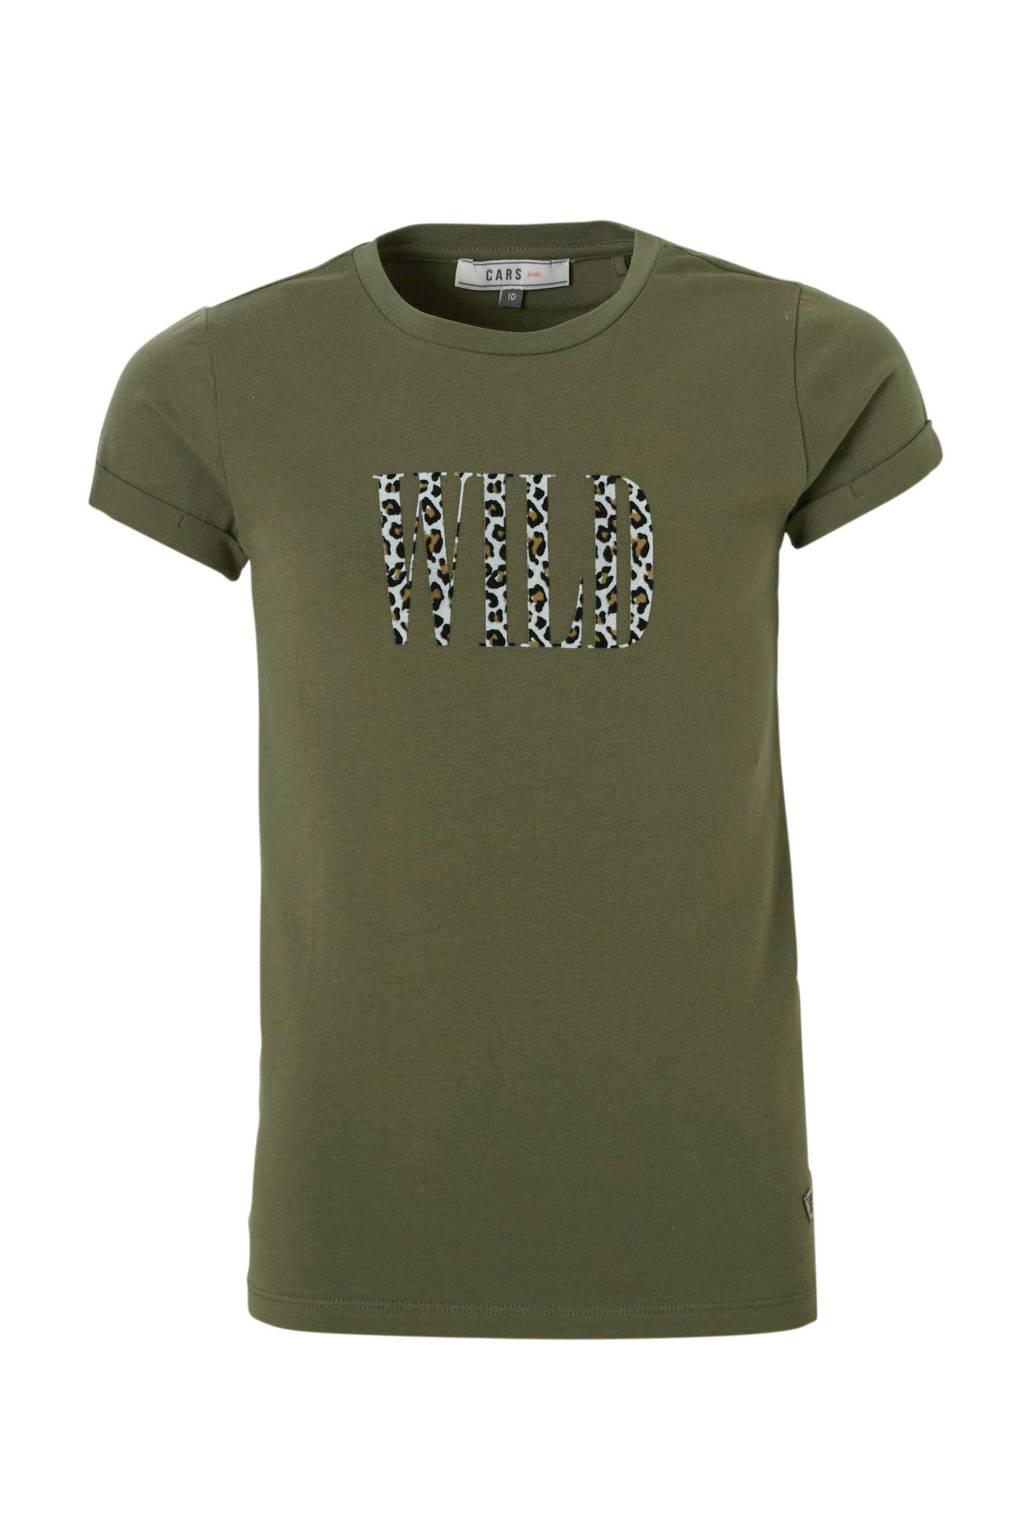 Cars T-shirt Emmarie met print army, Army